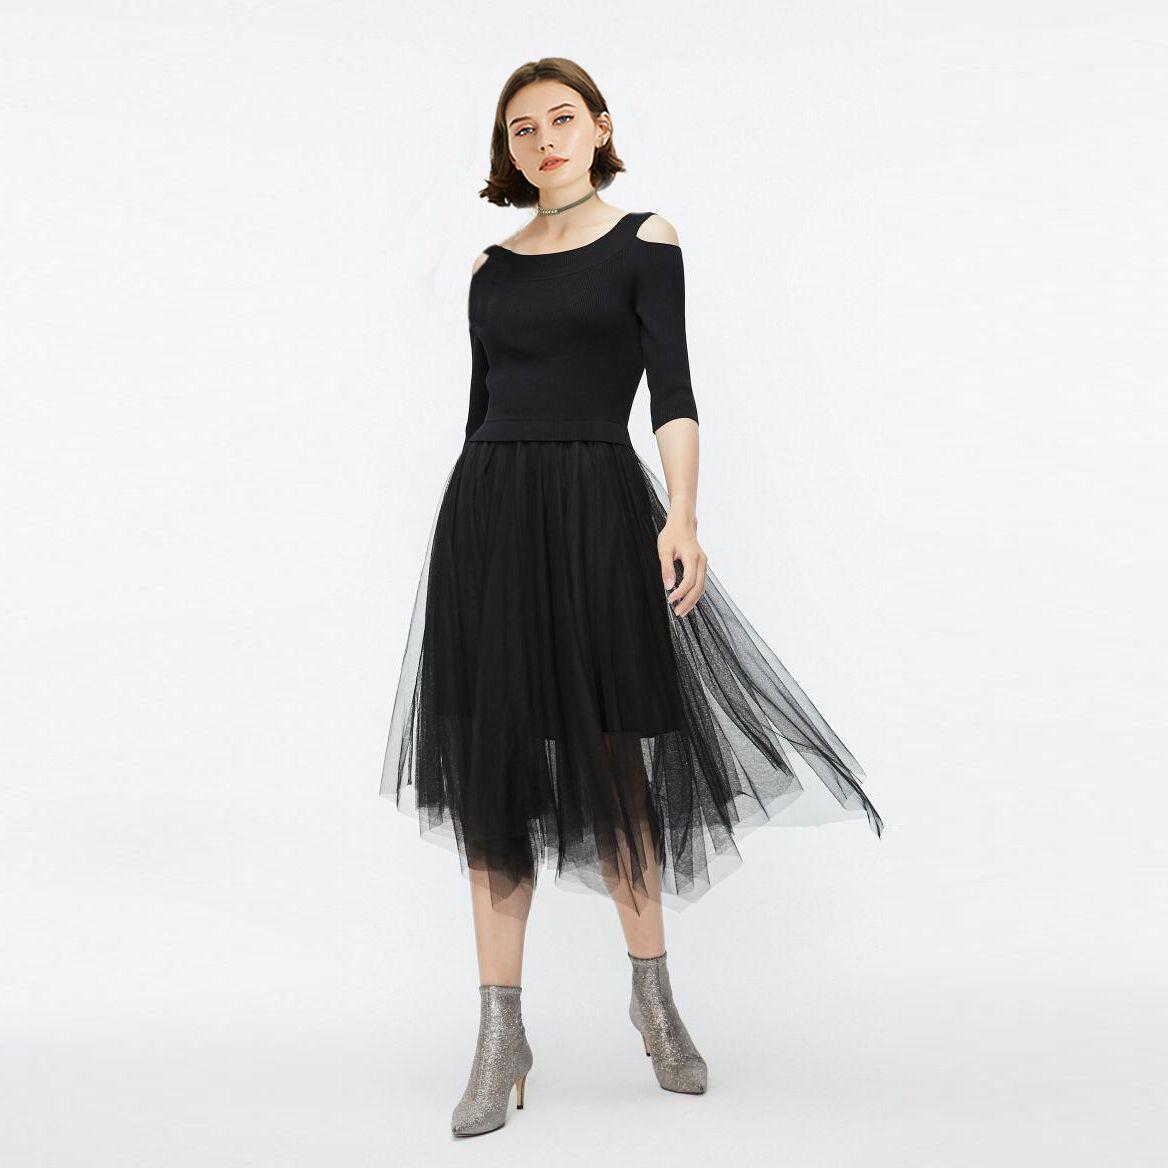 ONLY.LU2019冬季新款洋气网纱针织露肩连衣裙女119446515